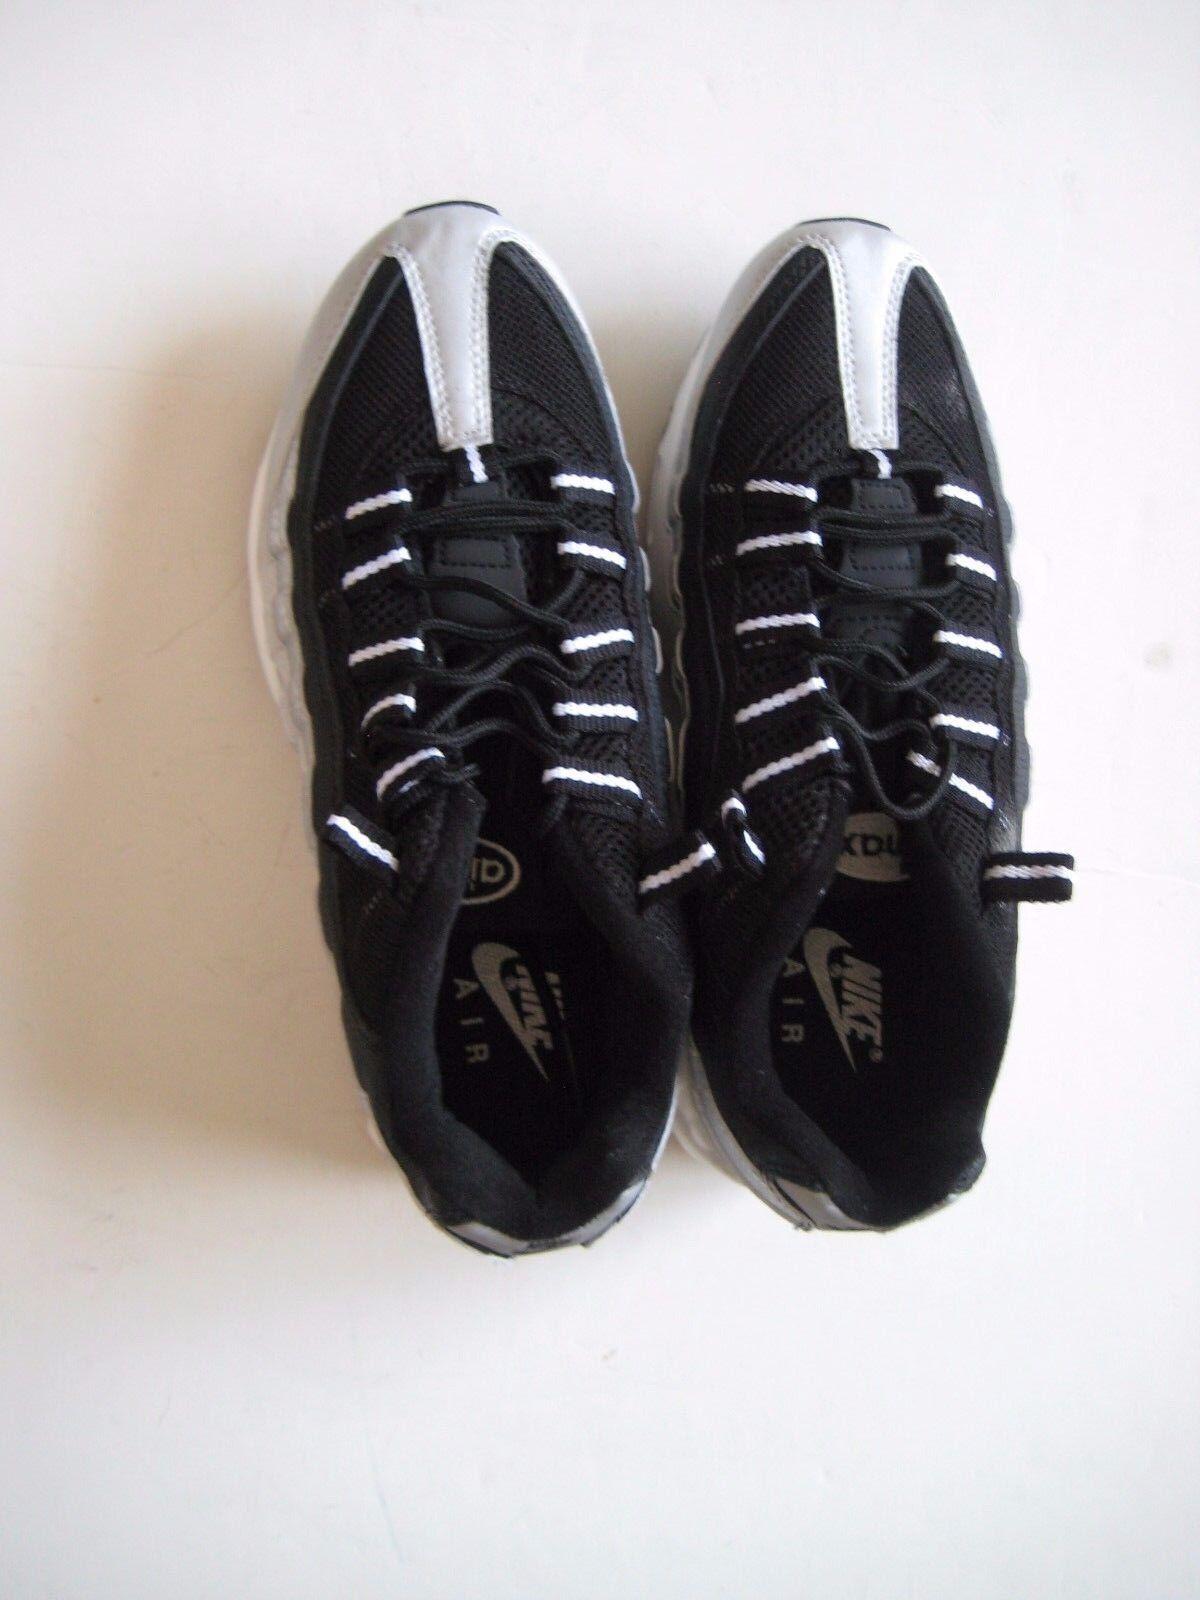 NIKE AIR MAX 95 Size 8 Platinum Sneaker New 104220-101